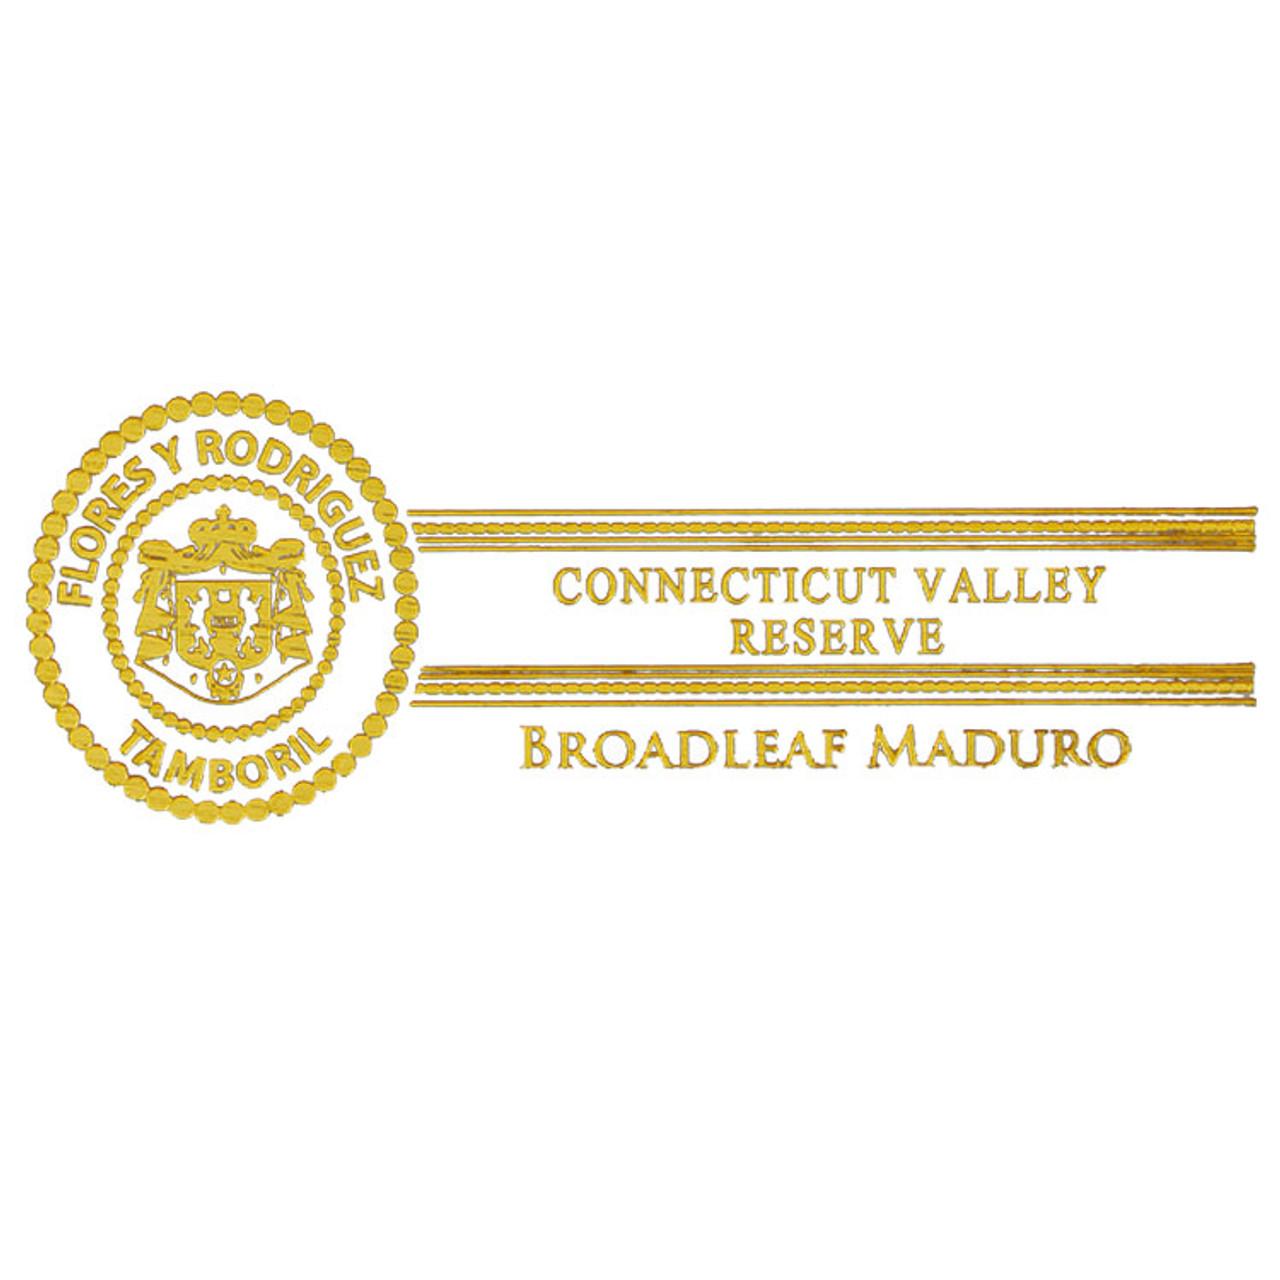 PDR Connecticut Valley Reserve Maduro Figurado Cigars - 6.5 x 52 (Jar of 19)